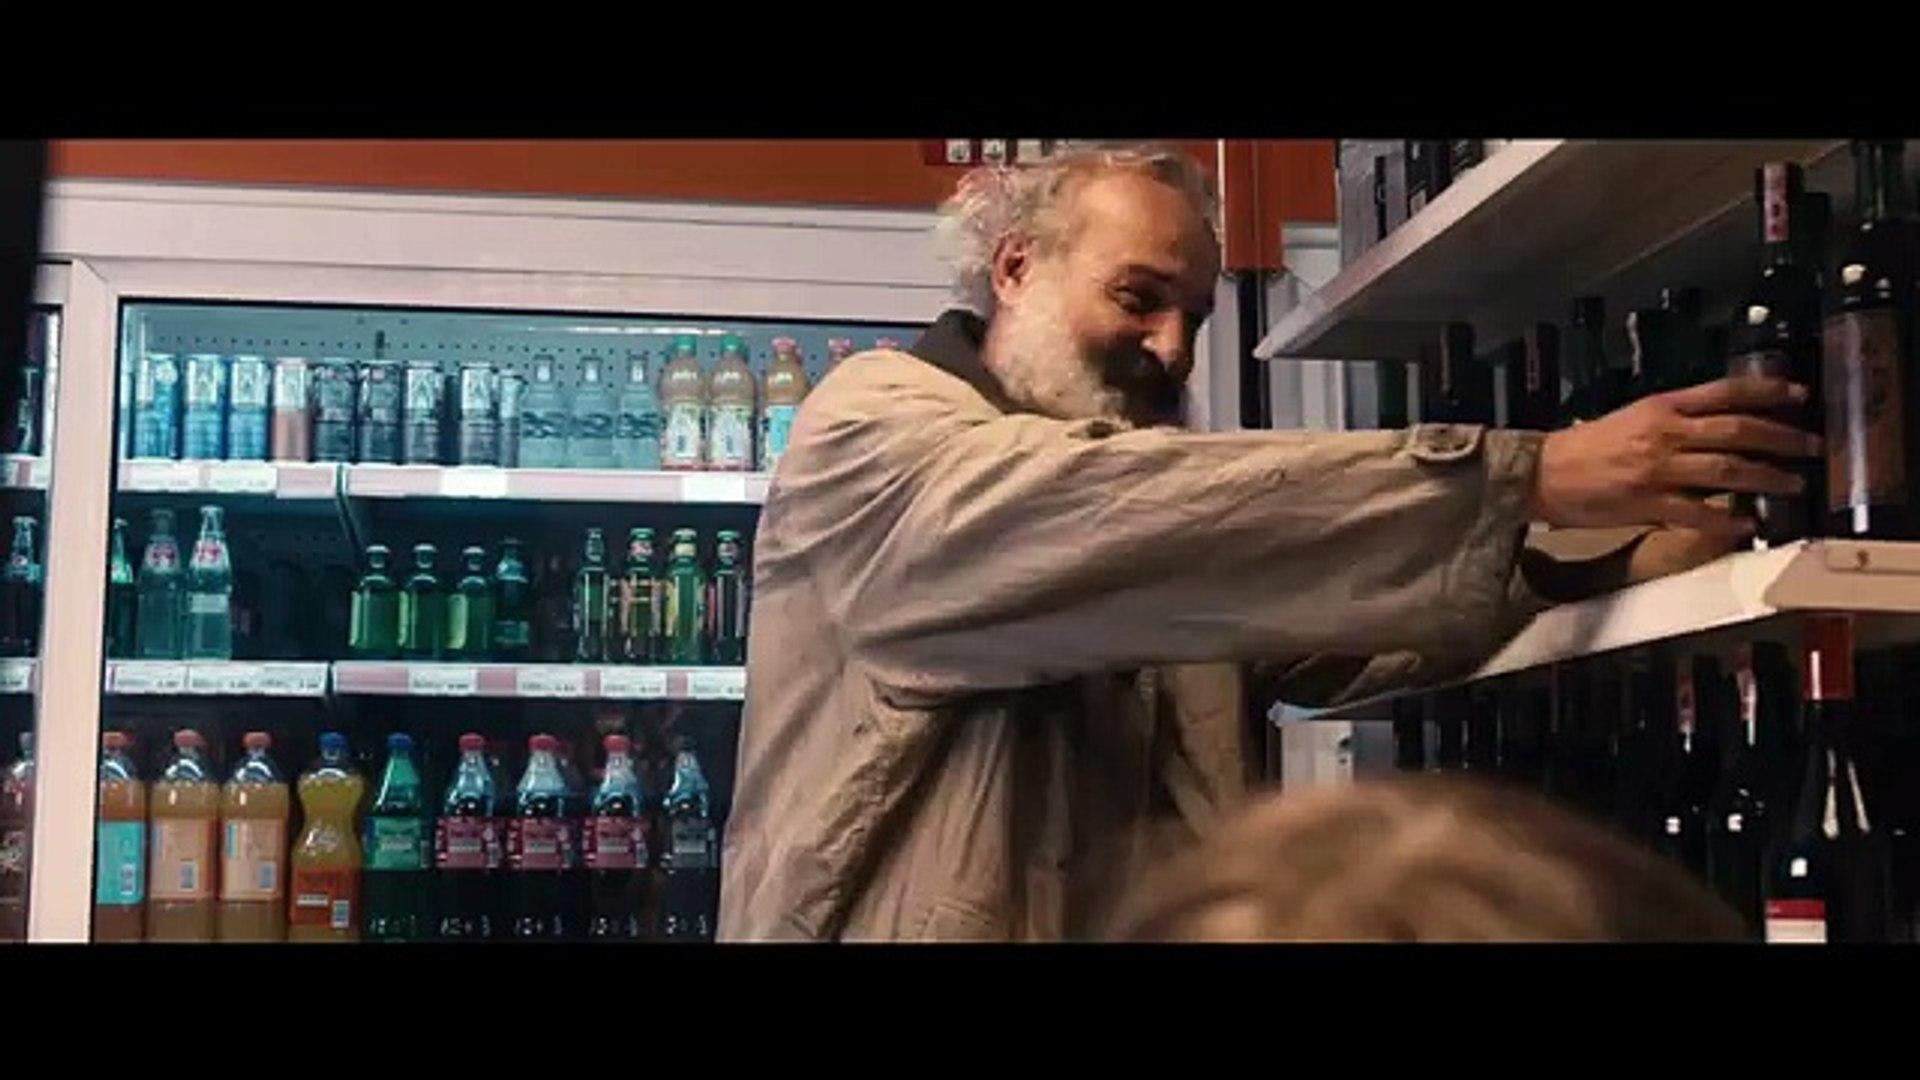 Terkedilmis izle - Terkedilmis Sinema Filmi teaser